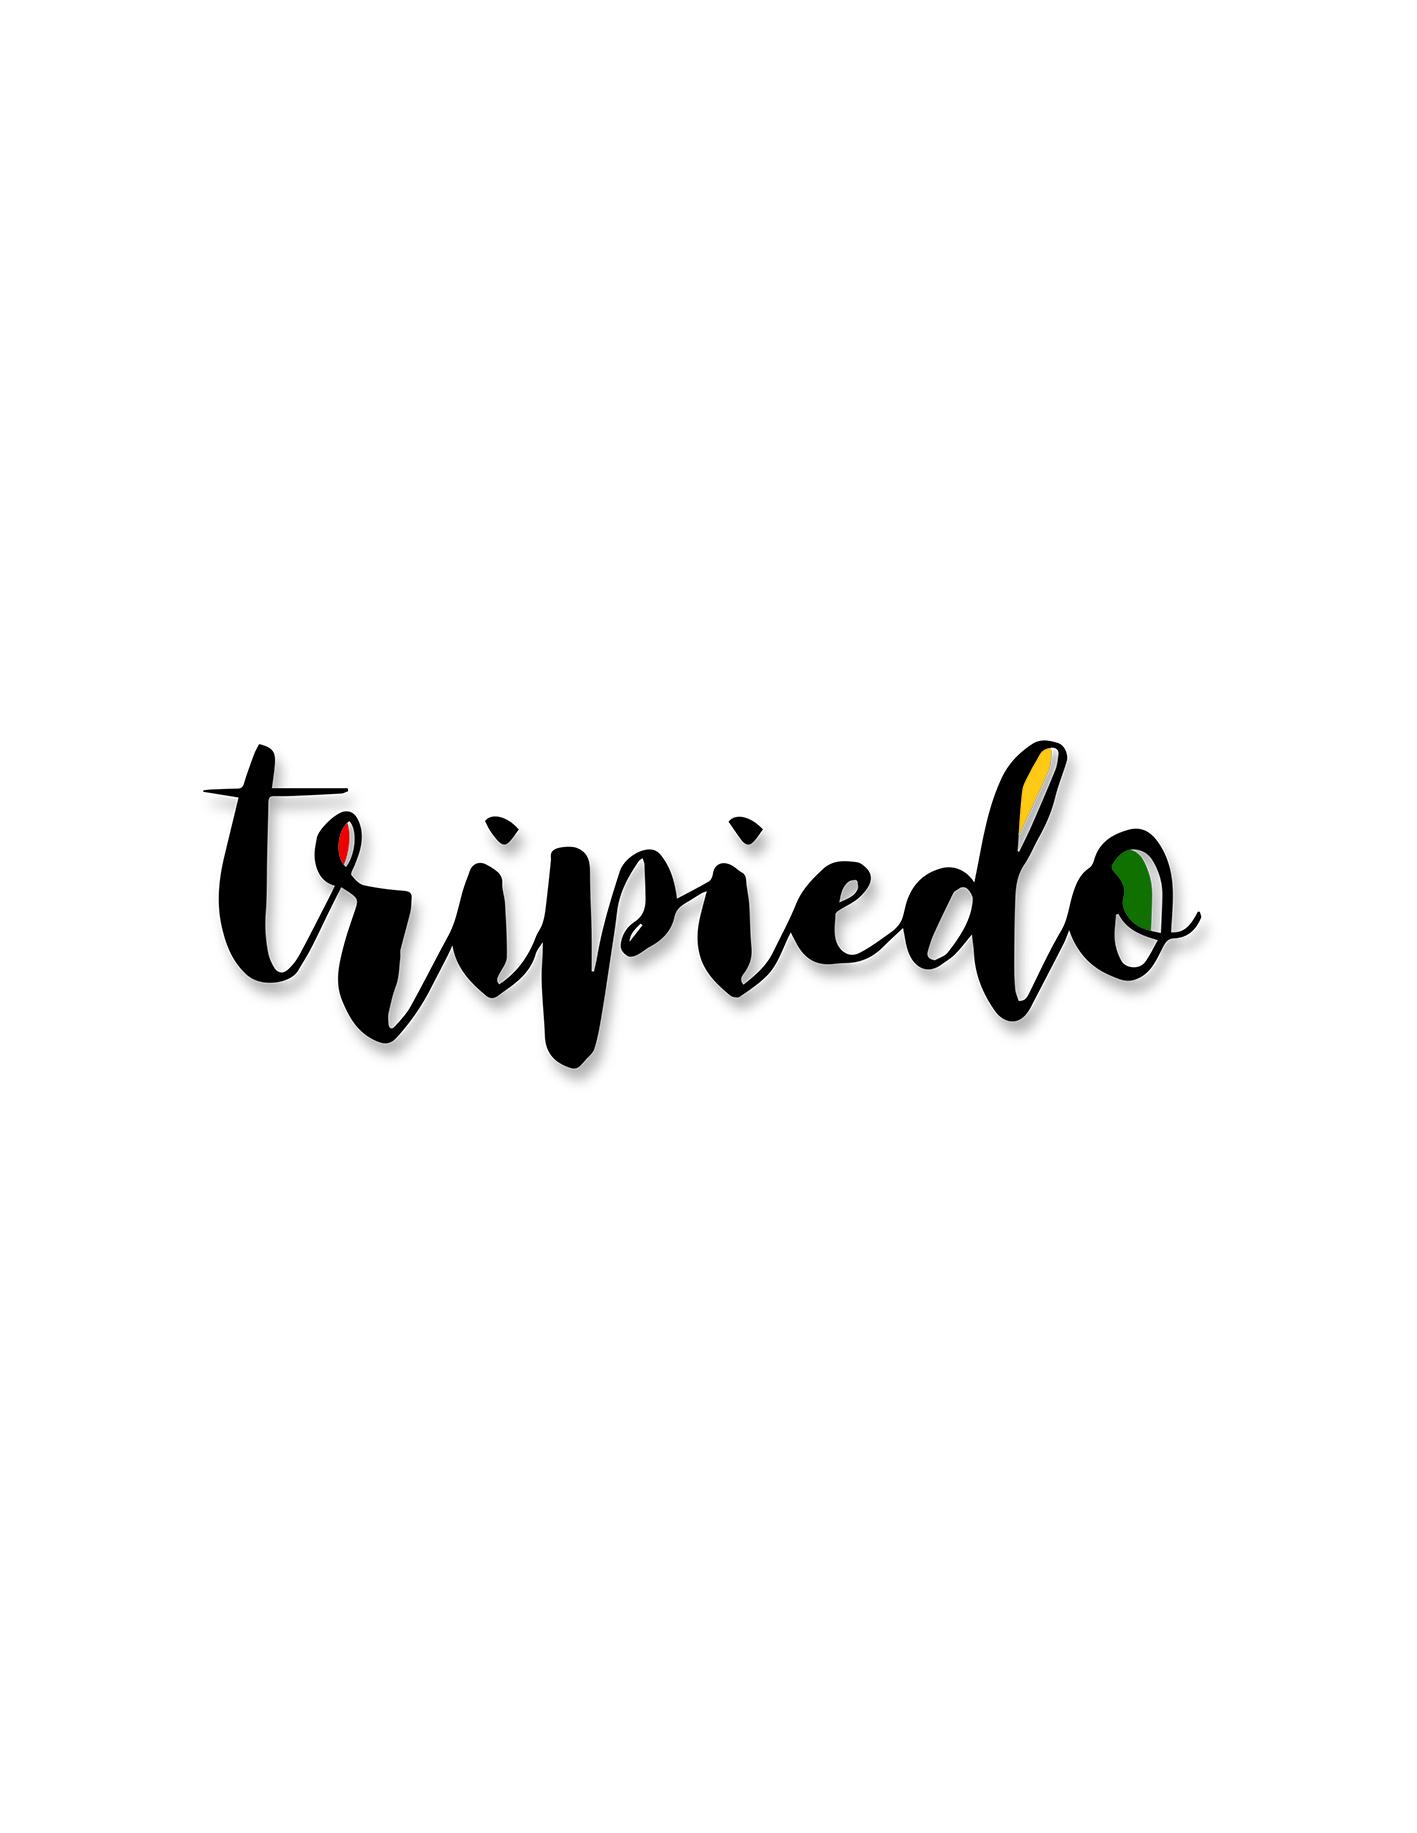 Tripiedo - compagnon de route